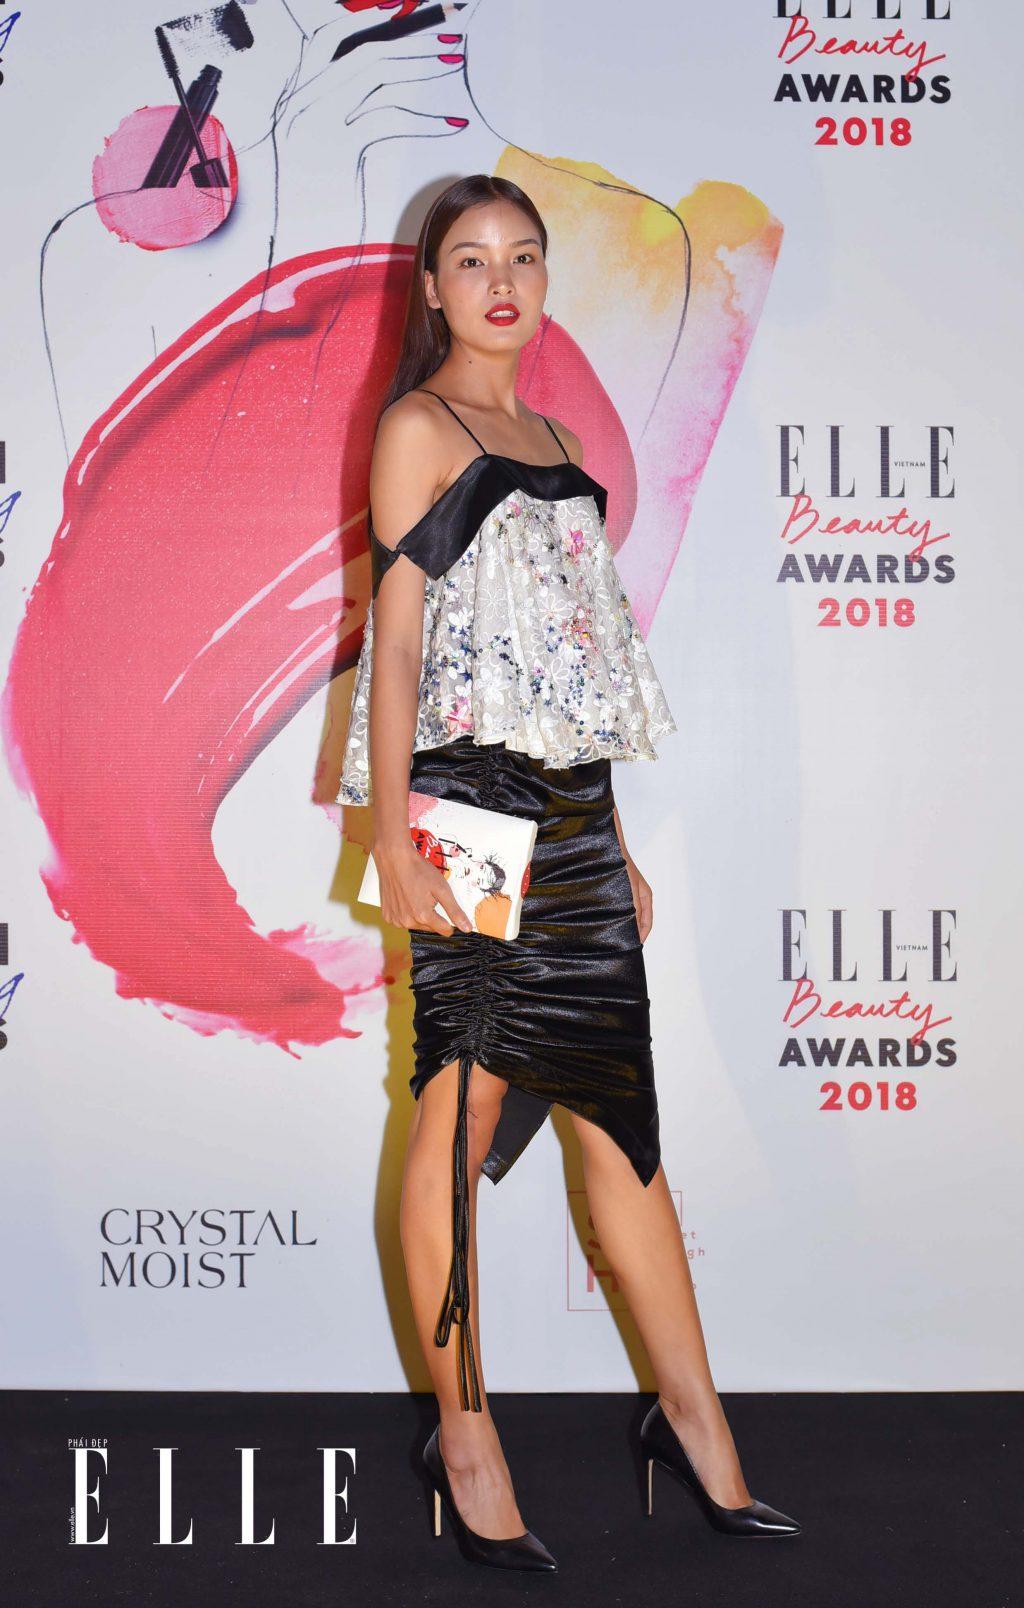 ELLE Beauty Awards 2018 trang điểm ấn tượng 6